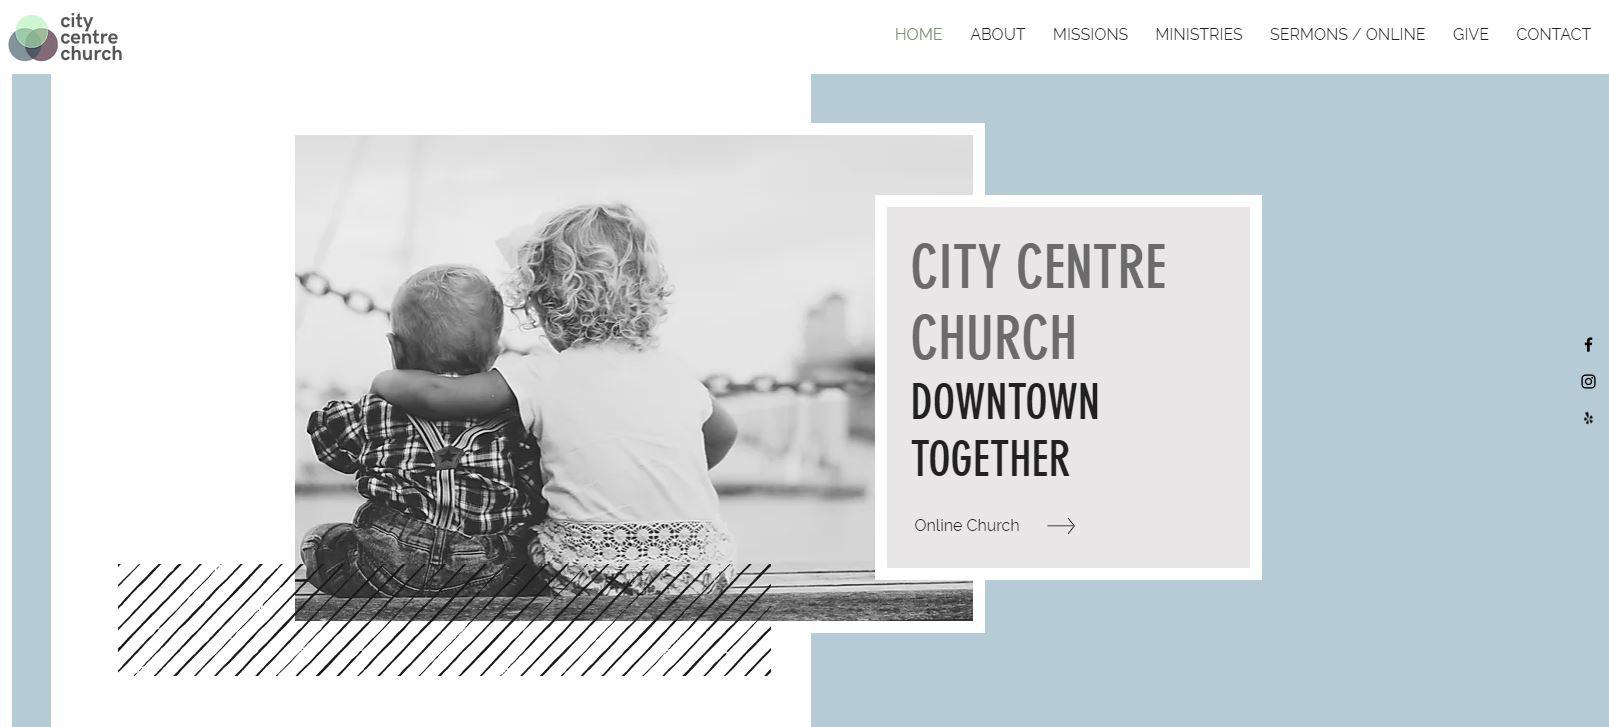 City Centre Church